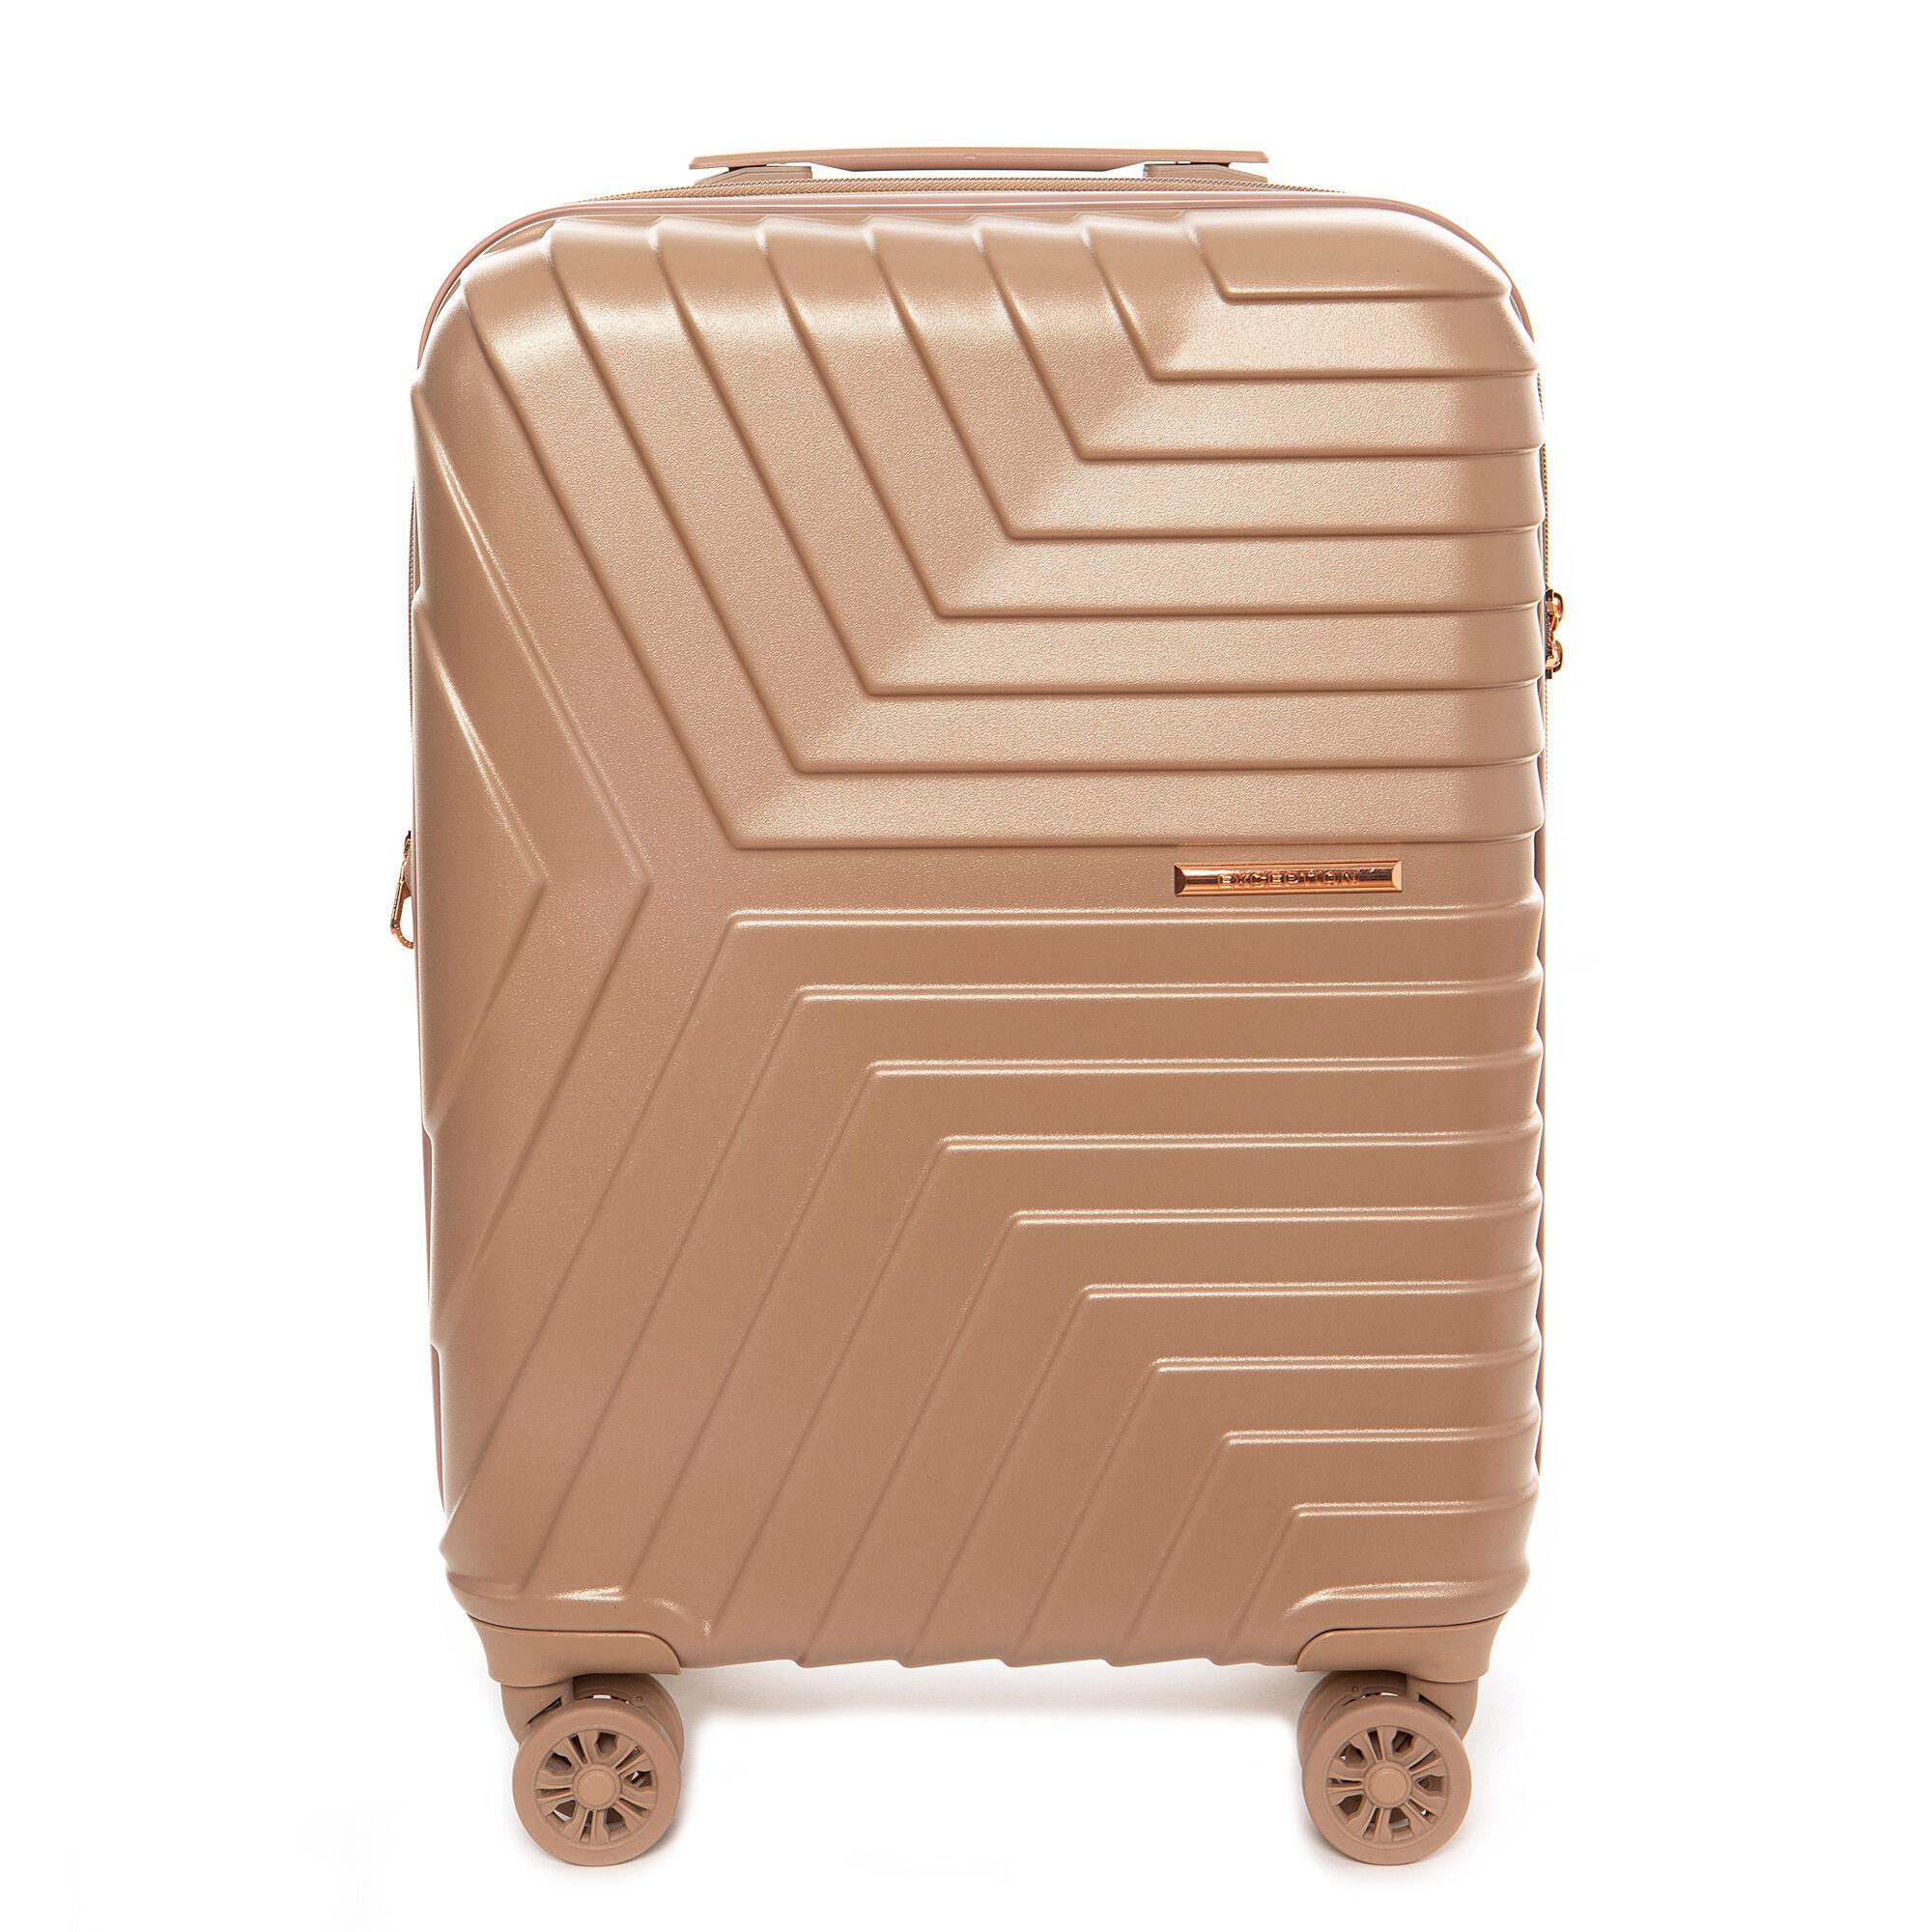 Lapin Accessories Βαλίτσα Ρόζ -Χρυσό